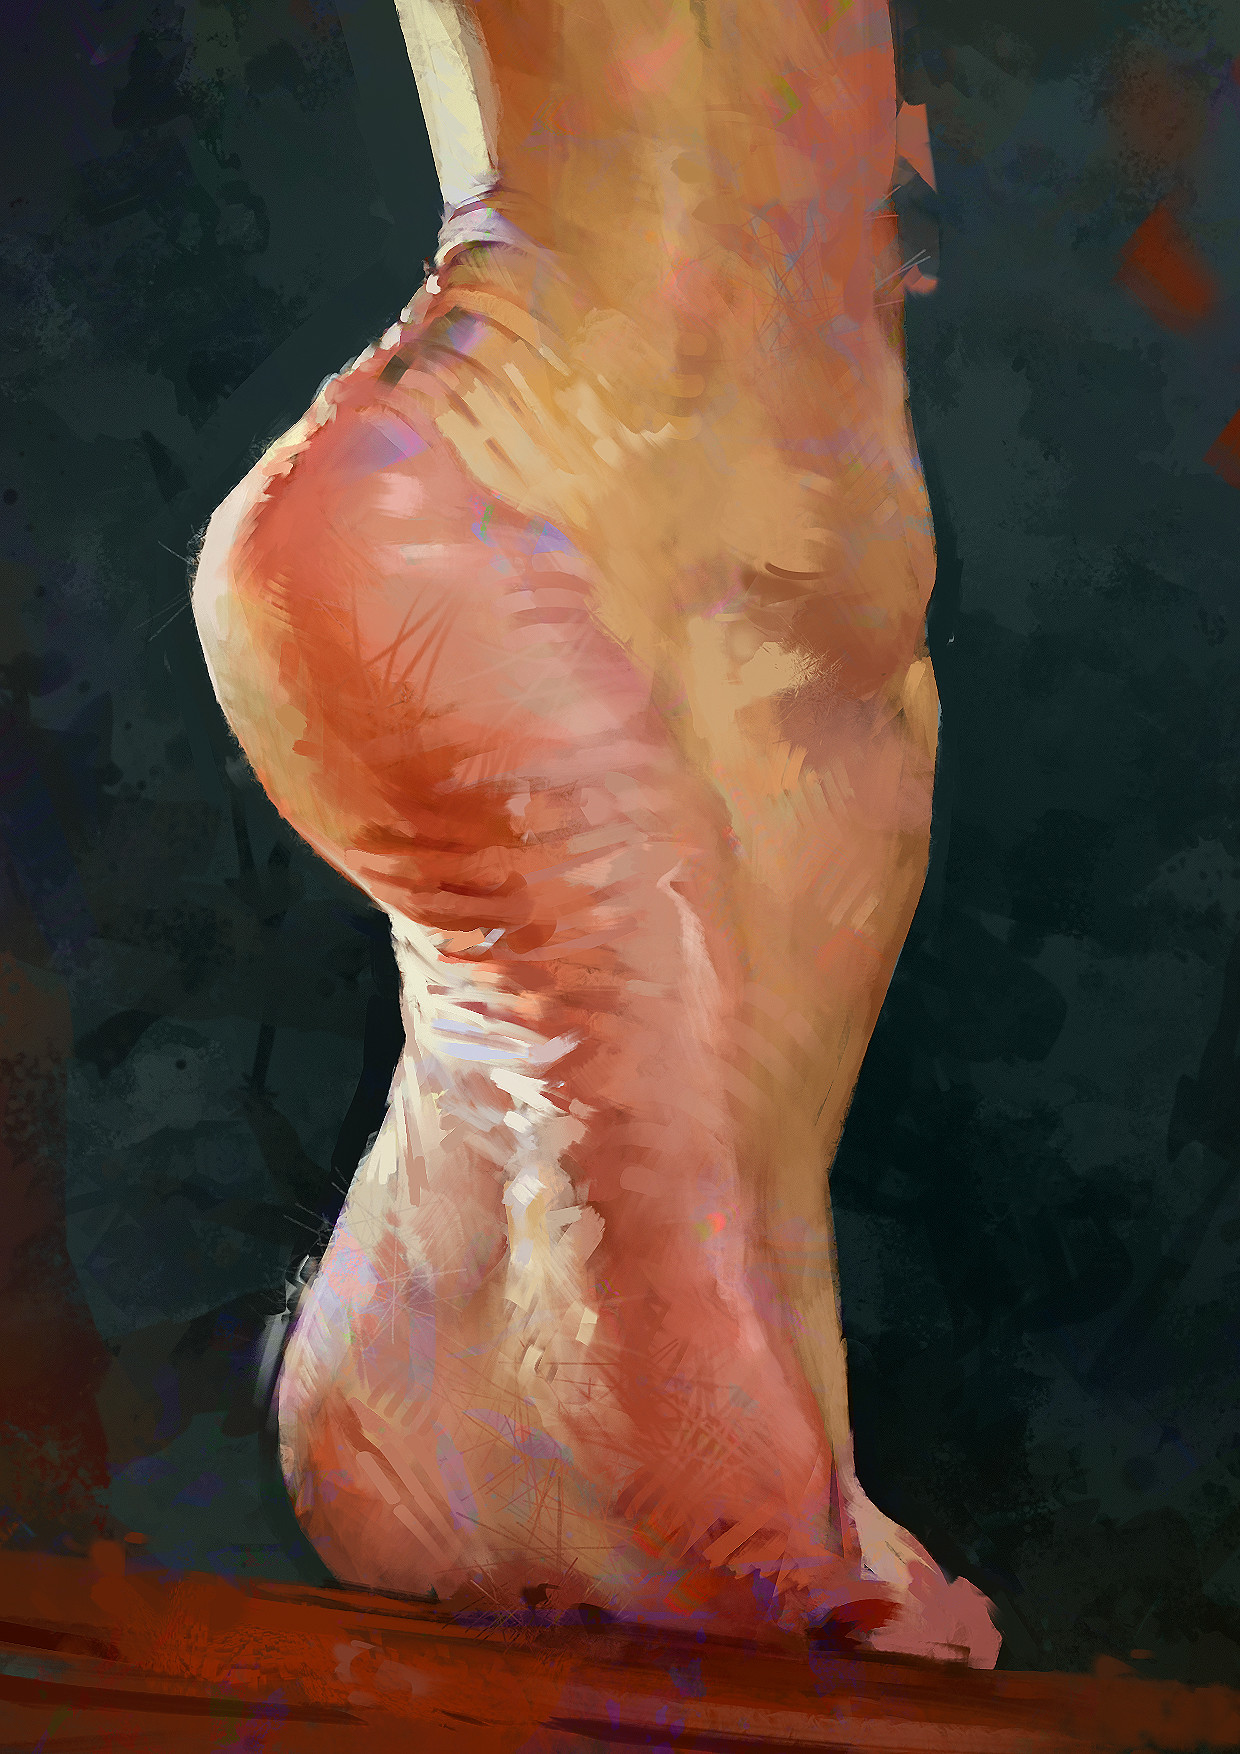 Aaron griffin foot study